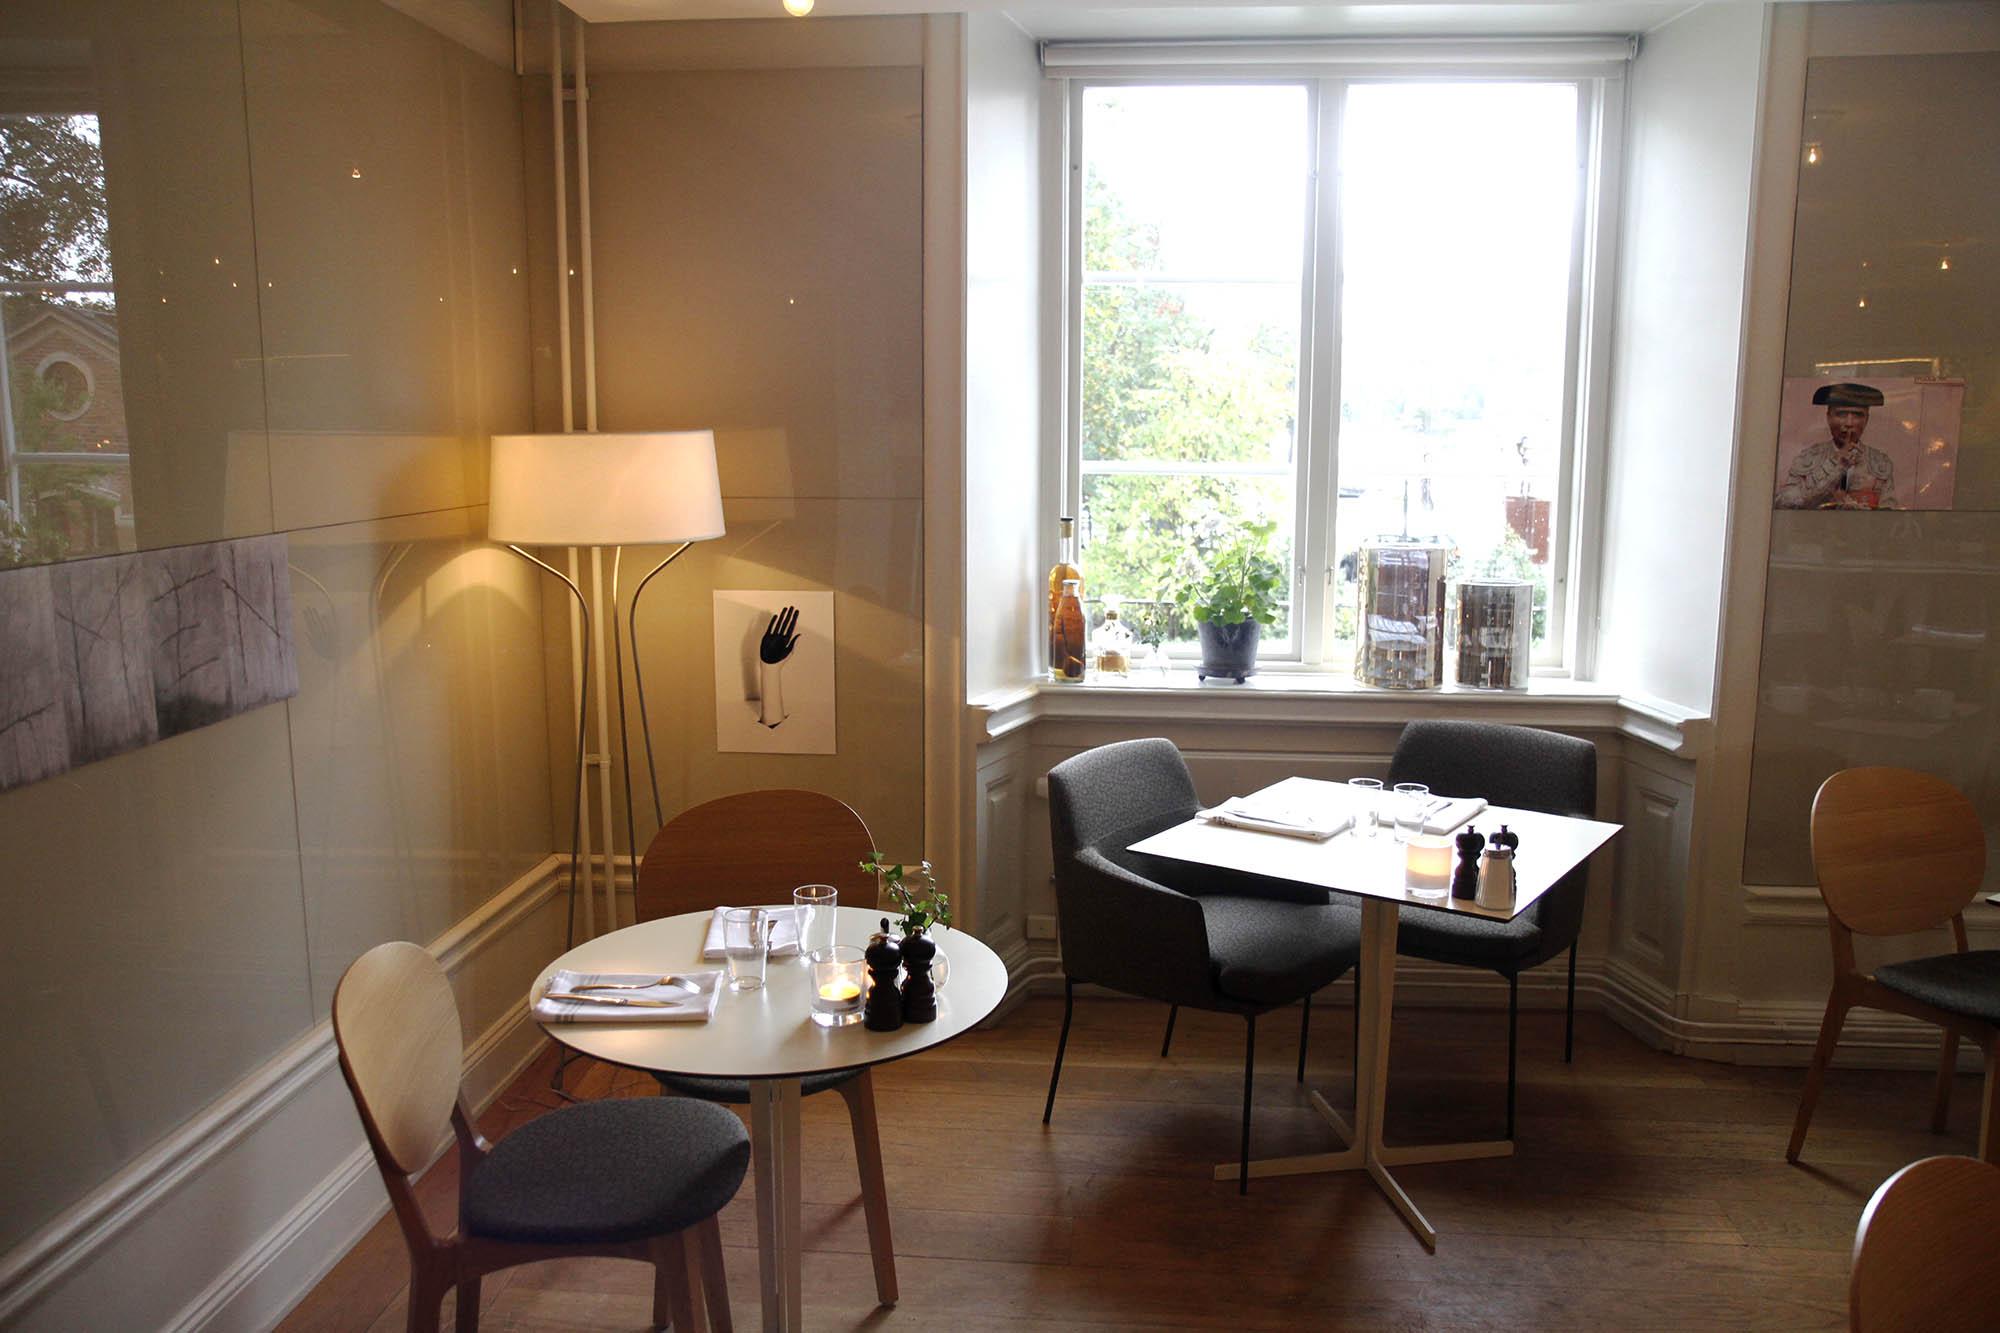 2017-04-Hotel-Skeppsholmen - hotel-skeppsholmen-stockholm-nectarandpulse-restaurant-16.jpg